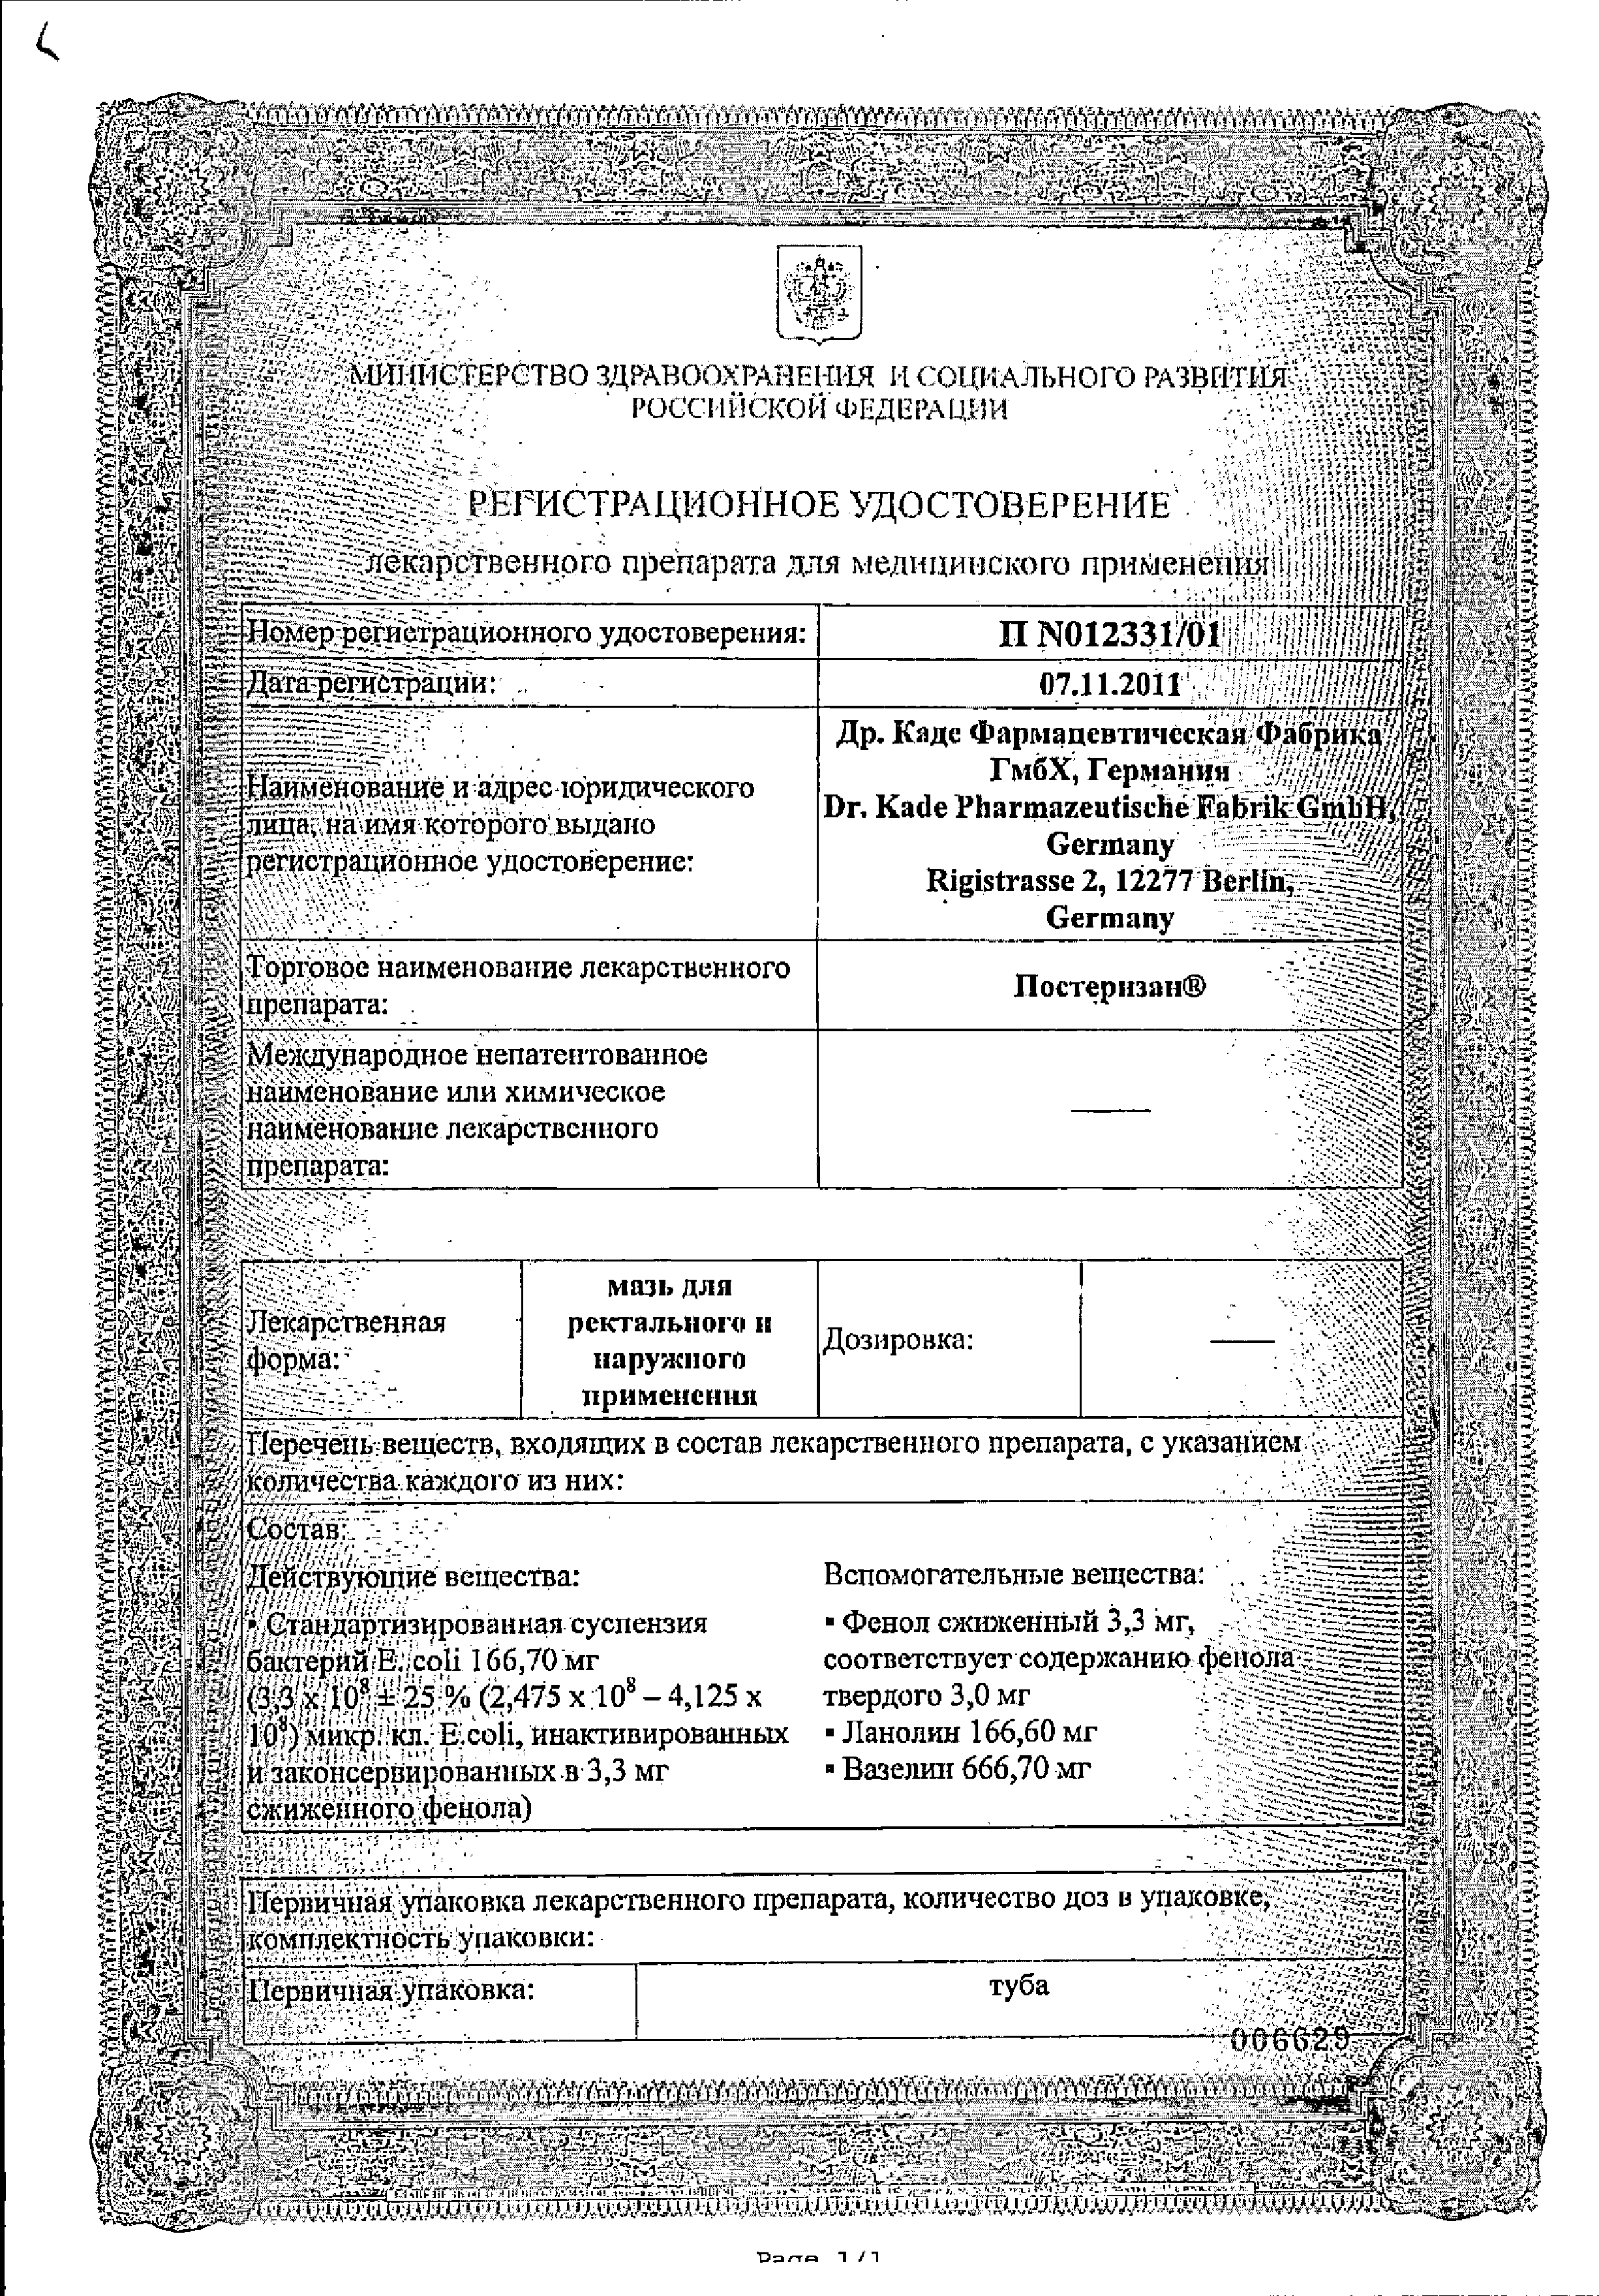 Постеризан сертификат